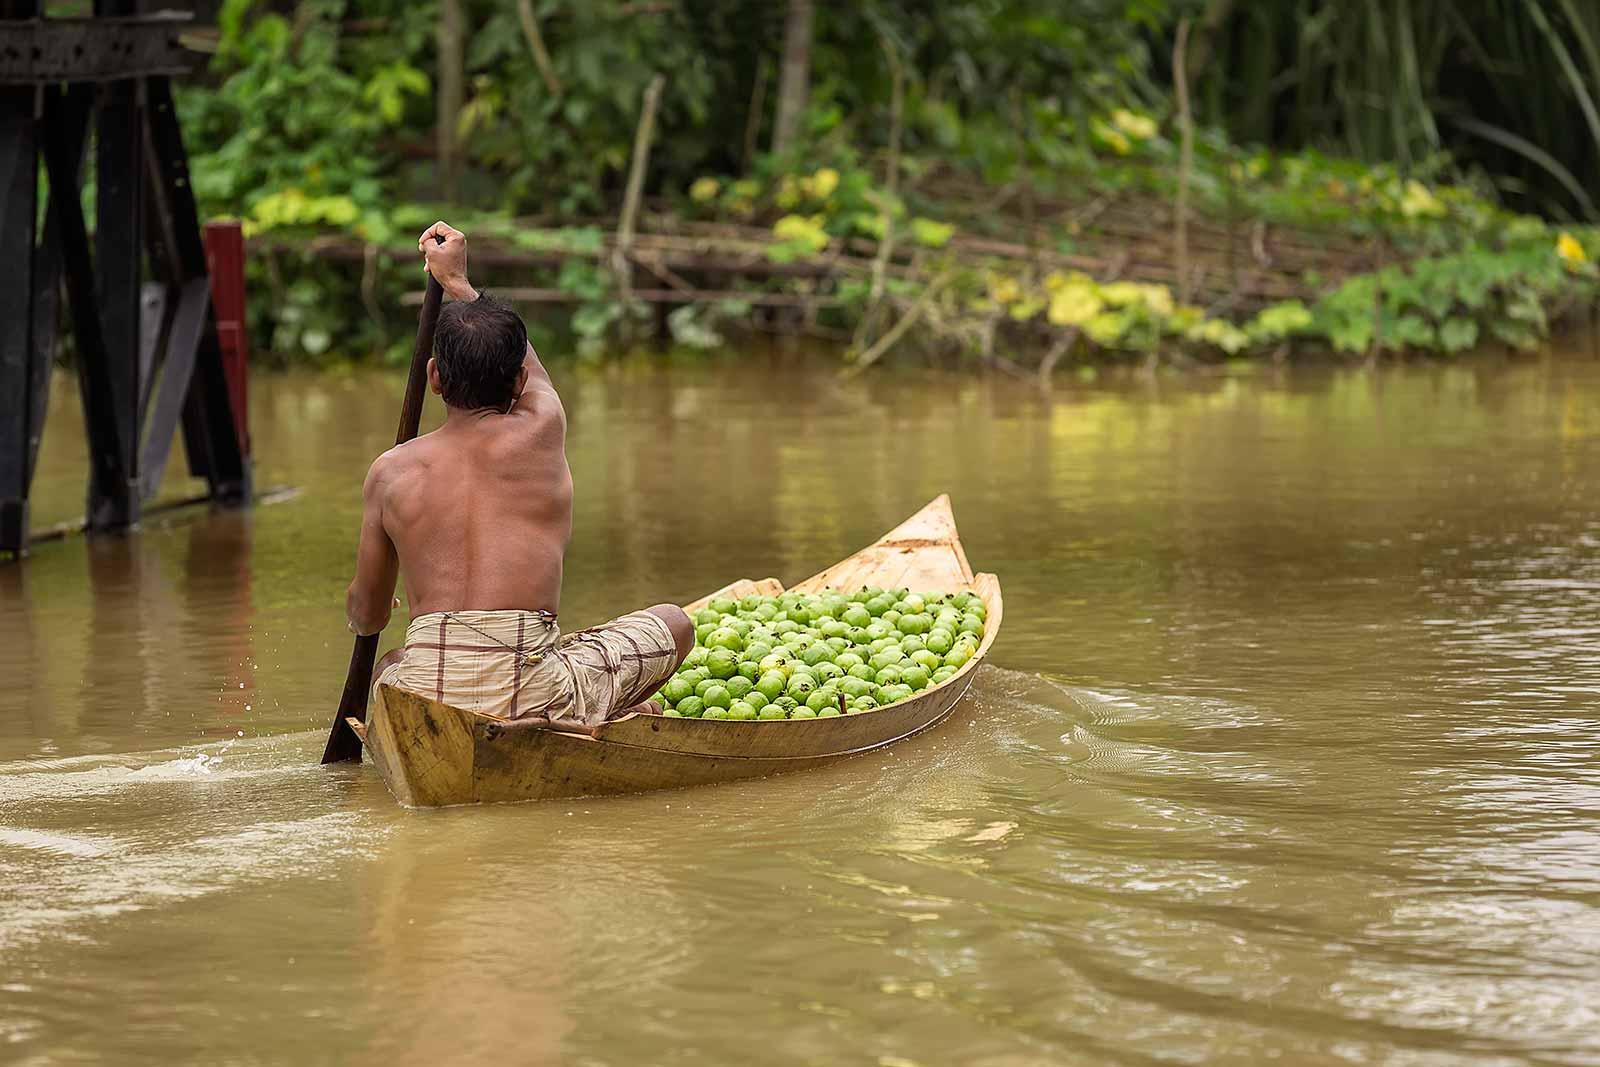 guava-plantations-boat-canal-swarupkathi-bangladesh-2